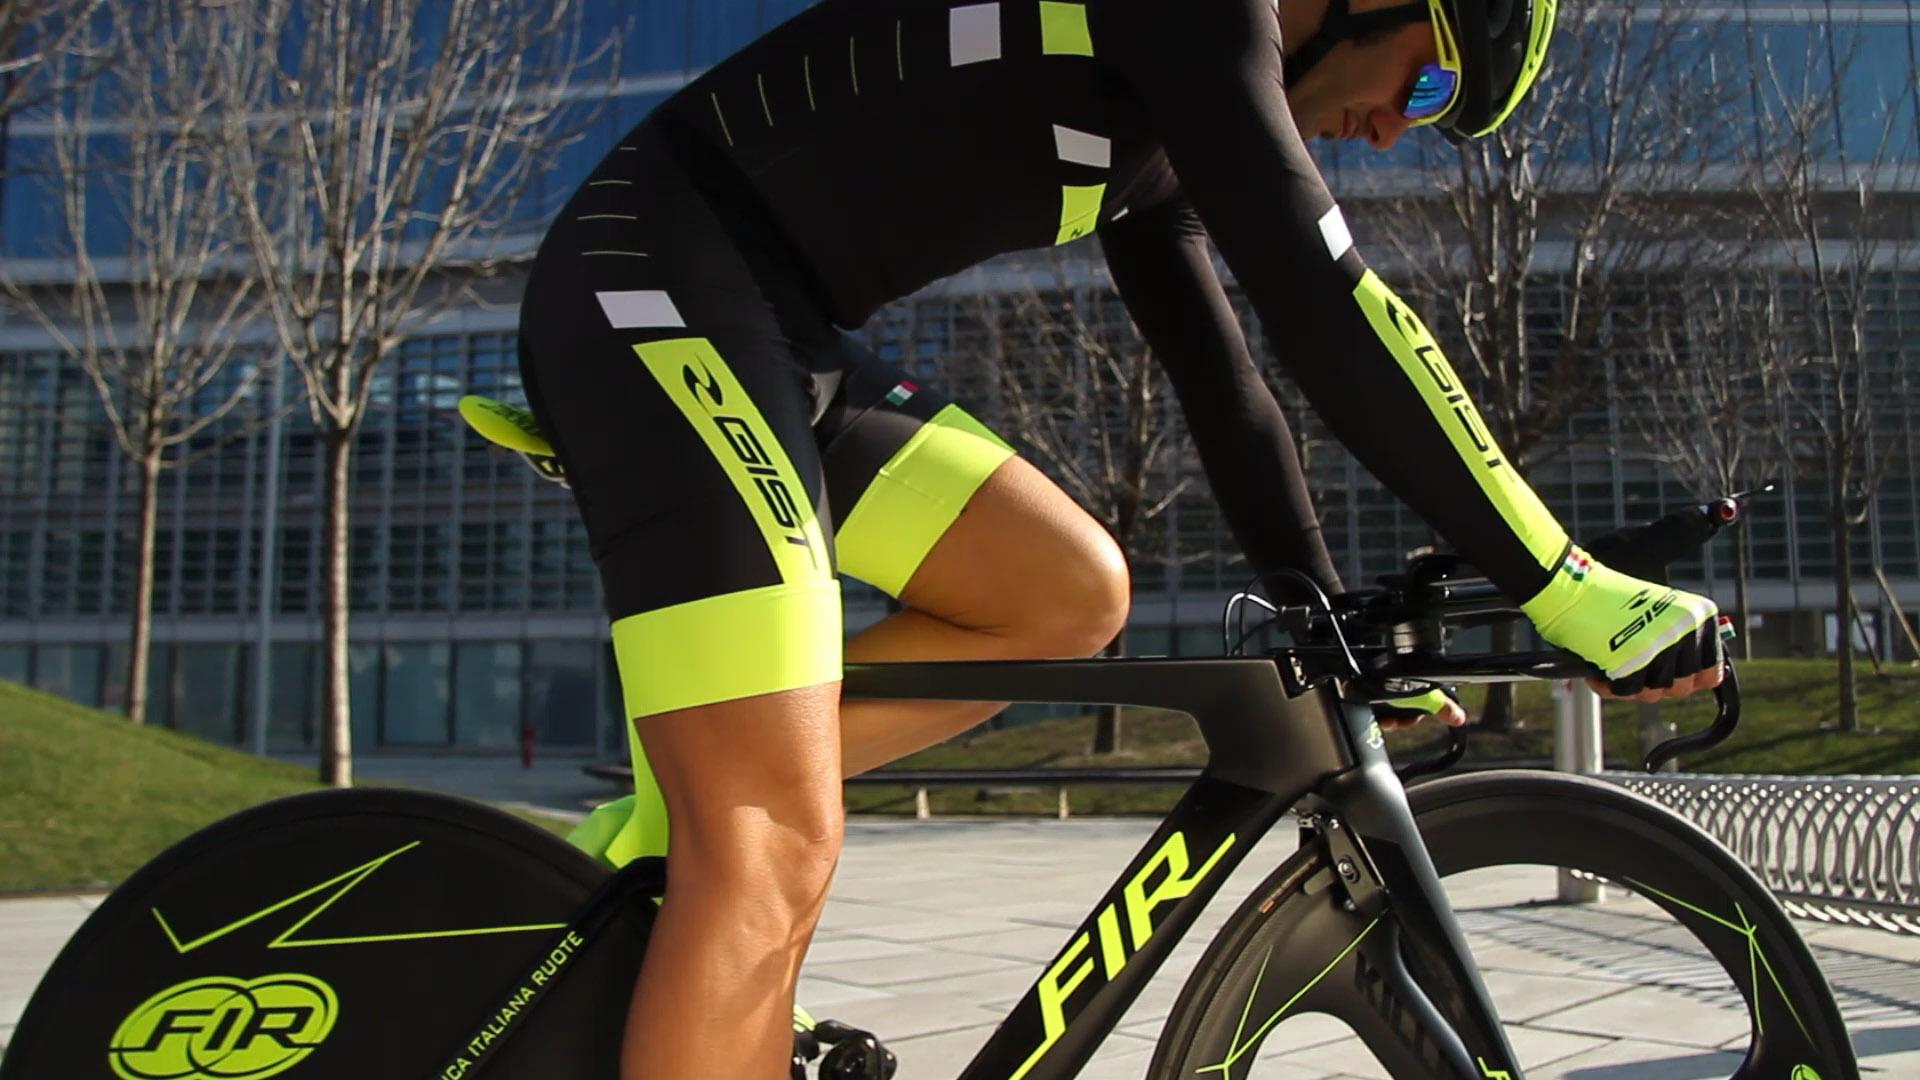 Cycling events: Soave Bike news